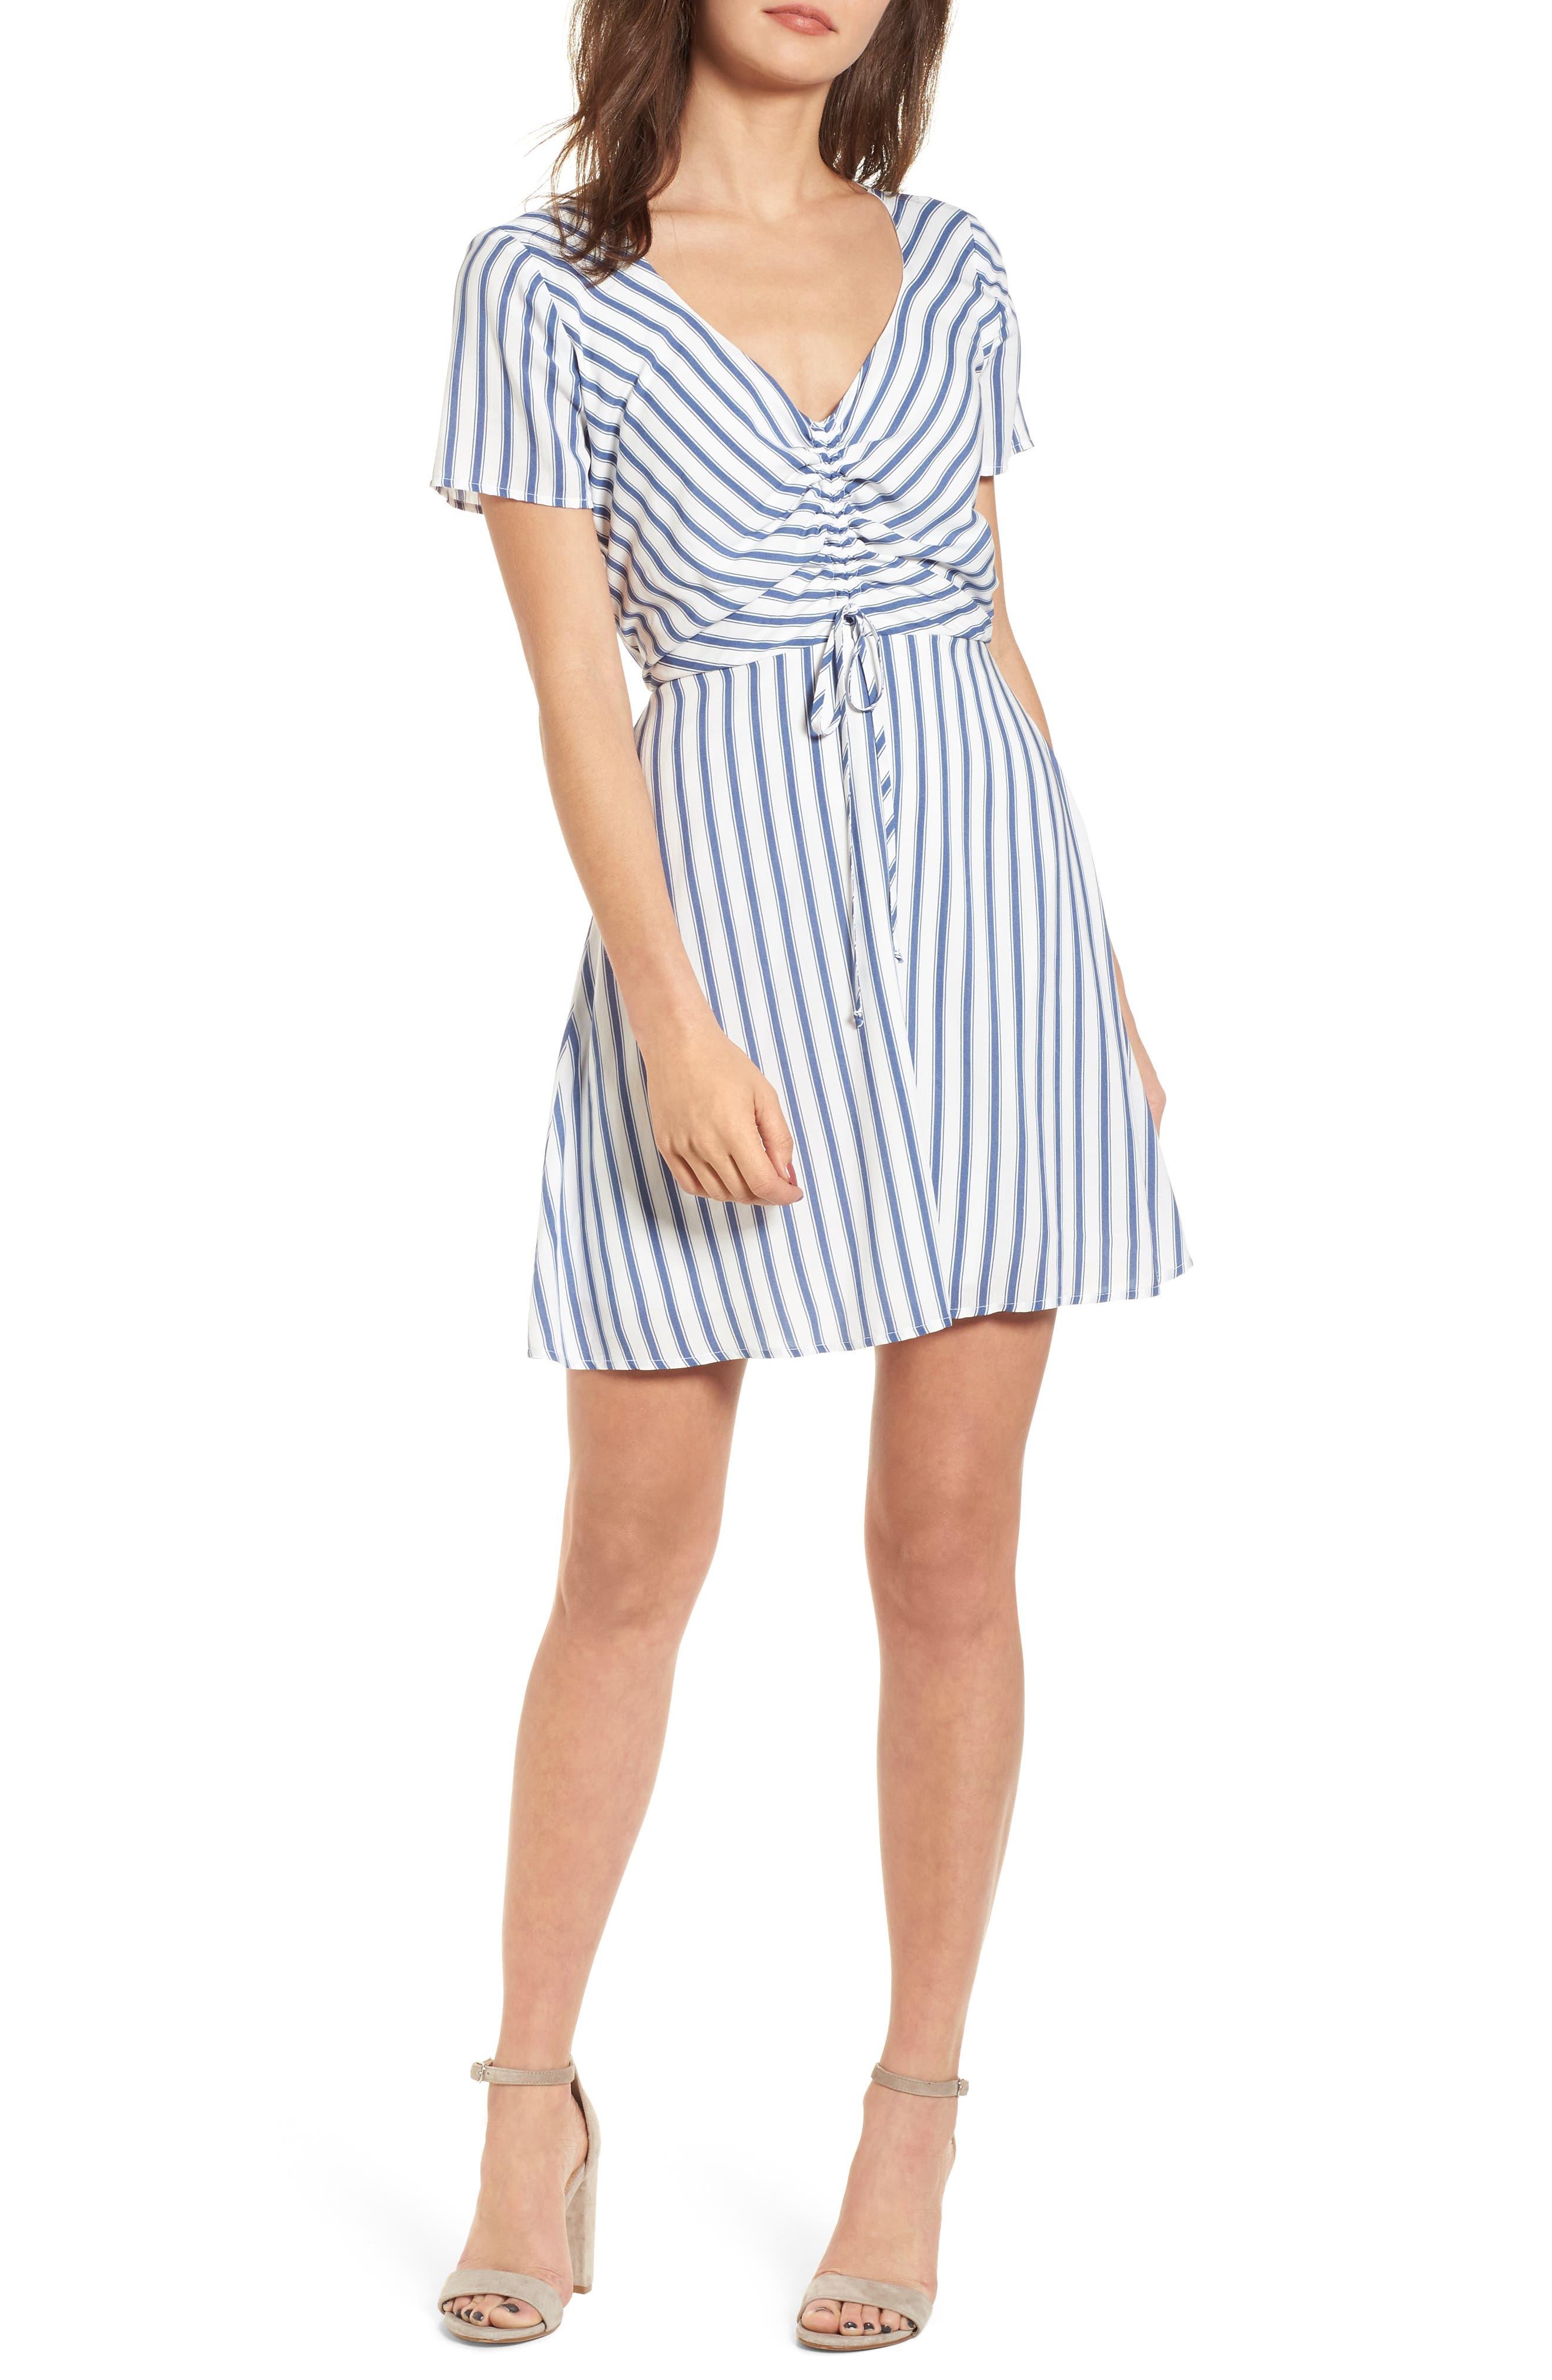 Cinch Front Minidress,                         Main,                         color, Blue/ White Stripe